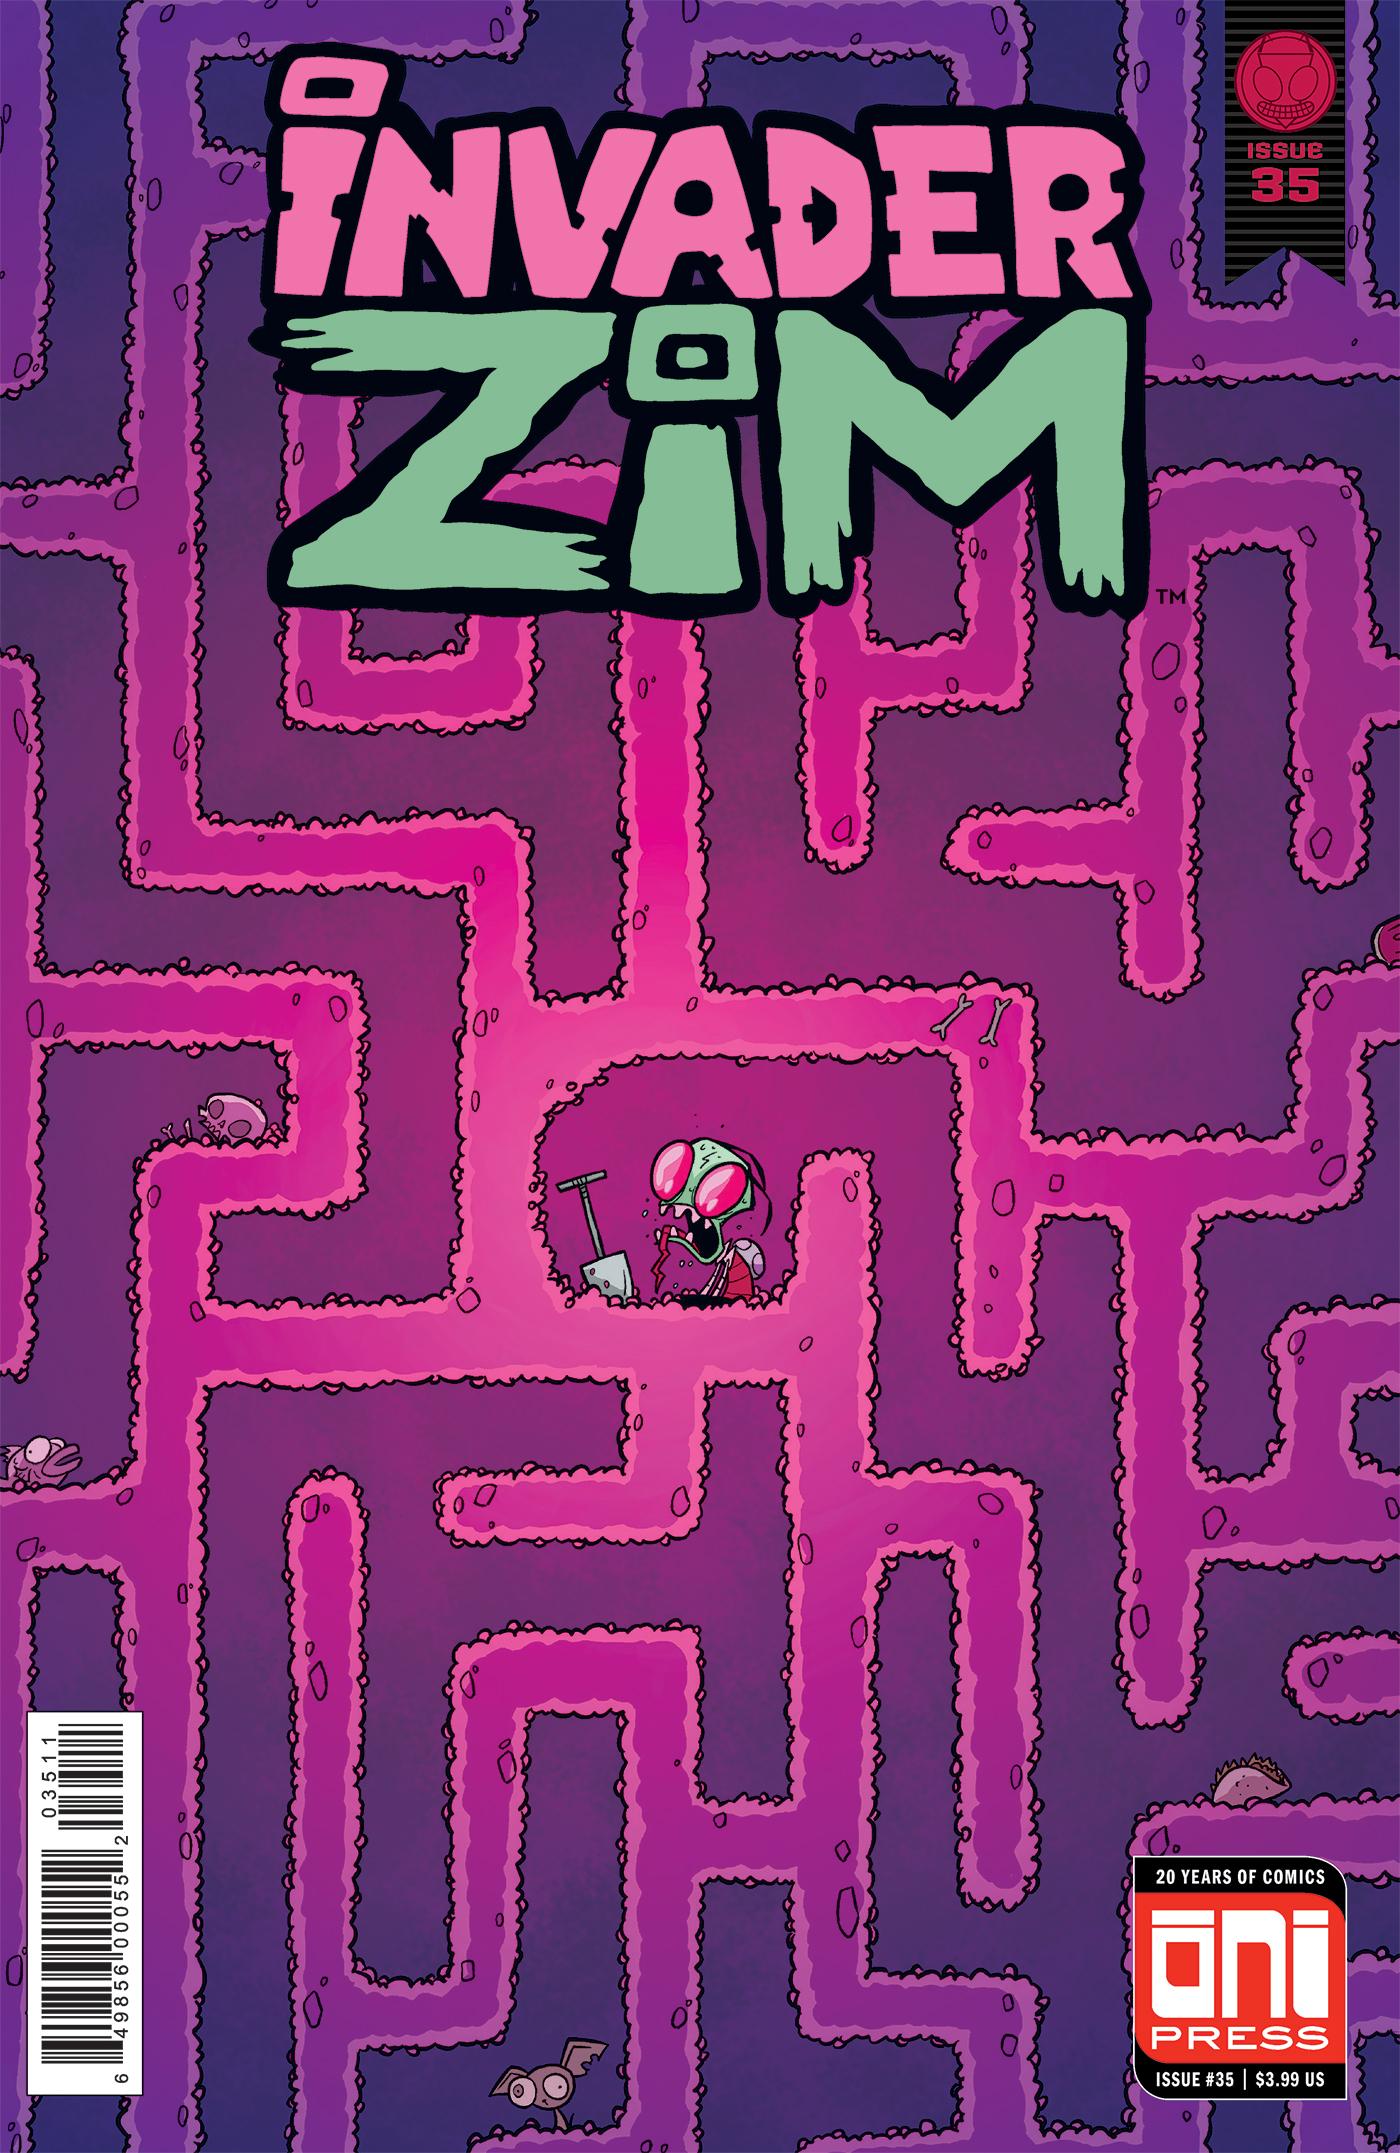 INVADER ZIM #35 CVR A